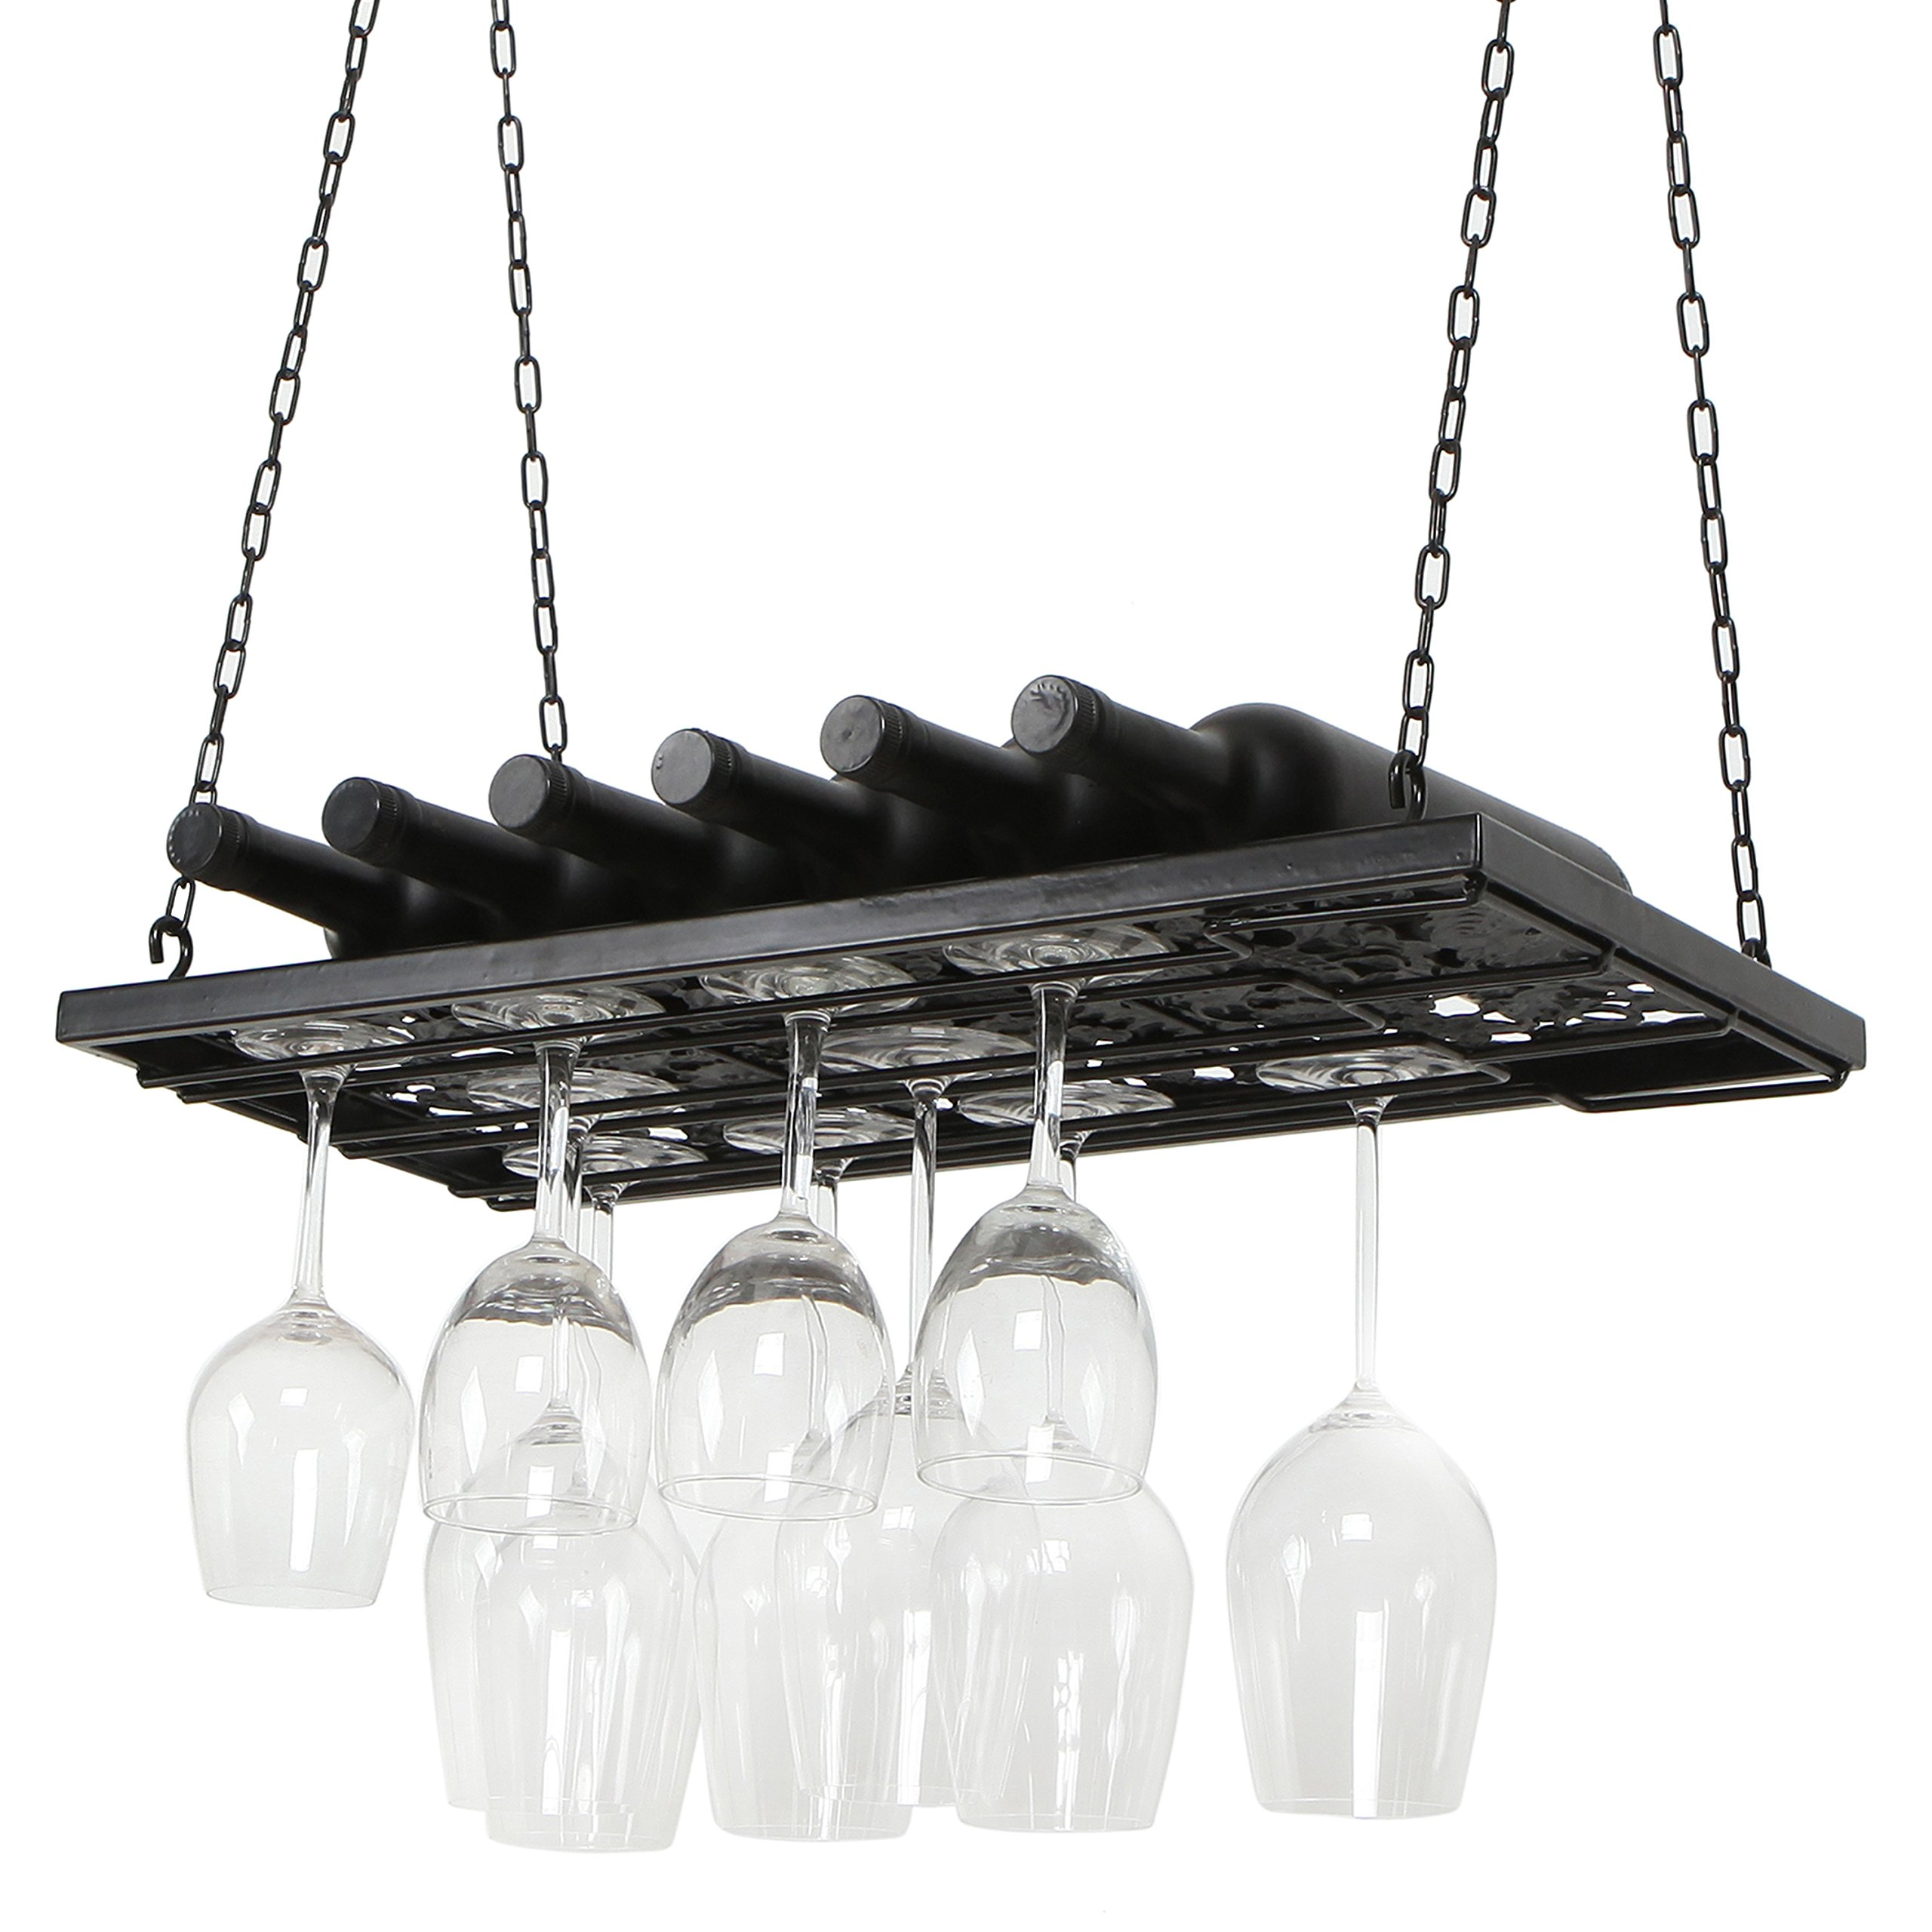 Vineyard Design Black Metal Ceiling Mounted Hanging Stemware Wine Glass Hanger Organizer Rack by MyGift